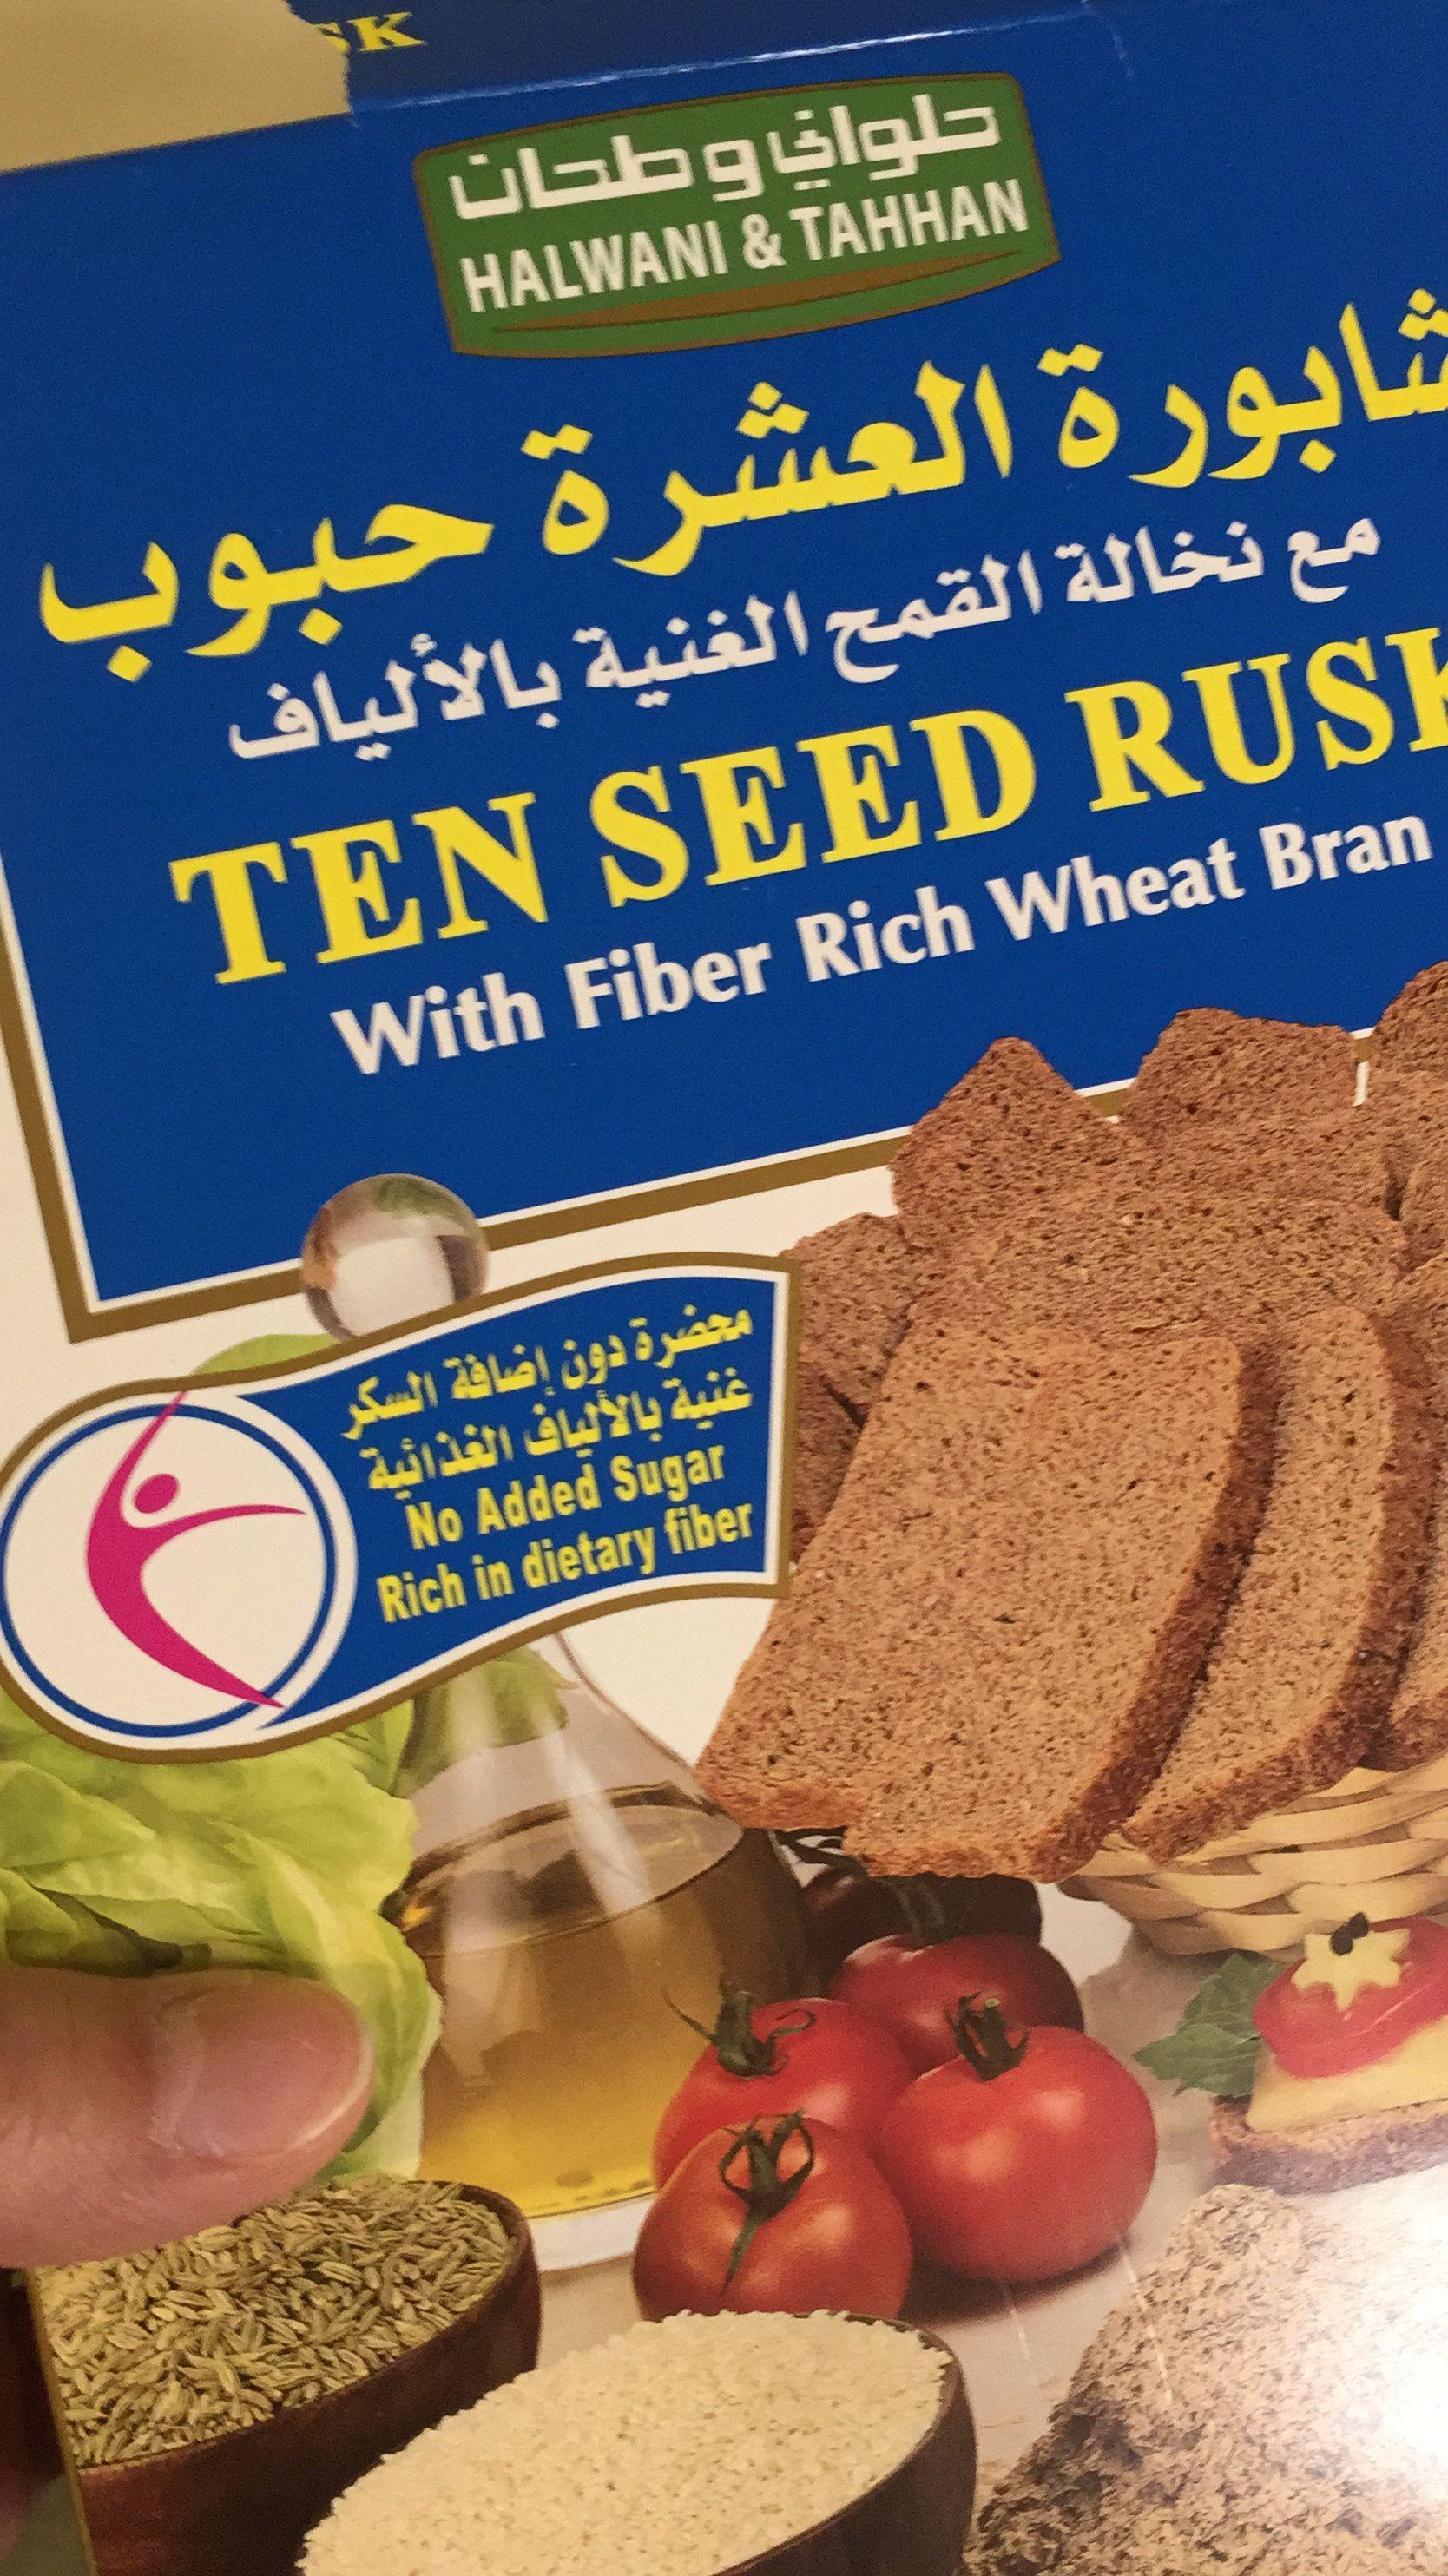 Pin By Eman Ali On Wisefull Pic Dietary Fiber Fiber Rich Ruse